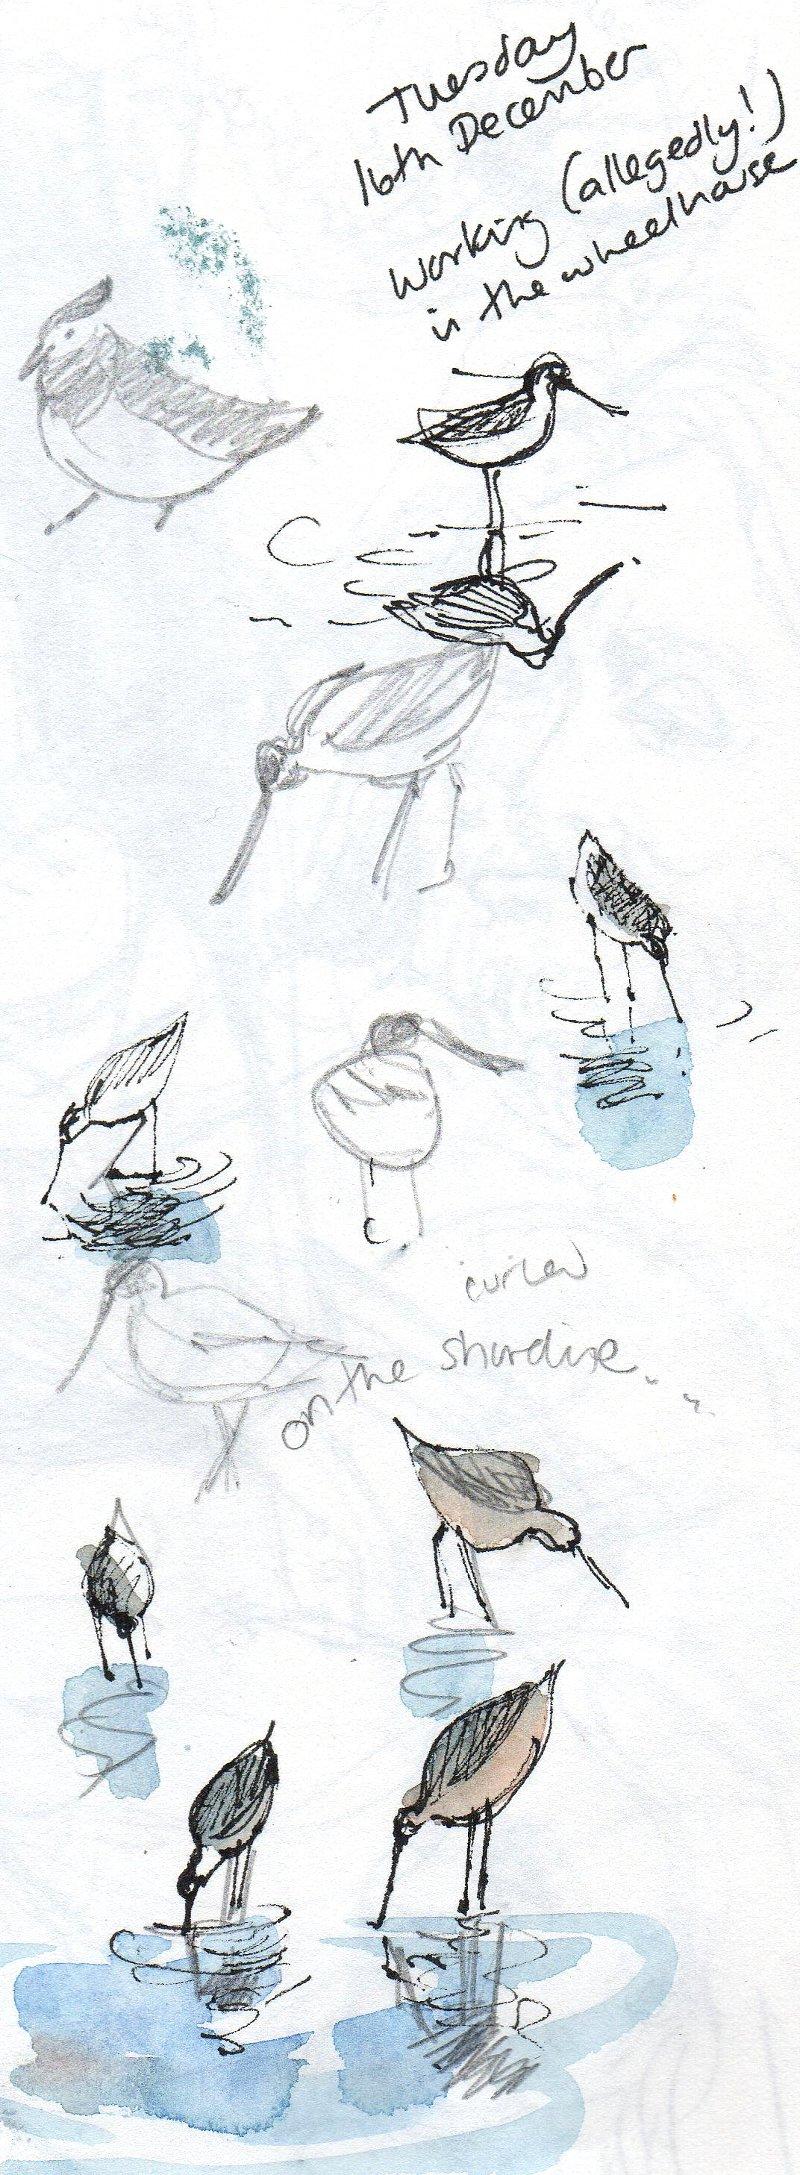 curlew sketch